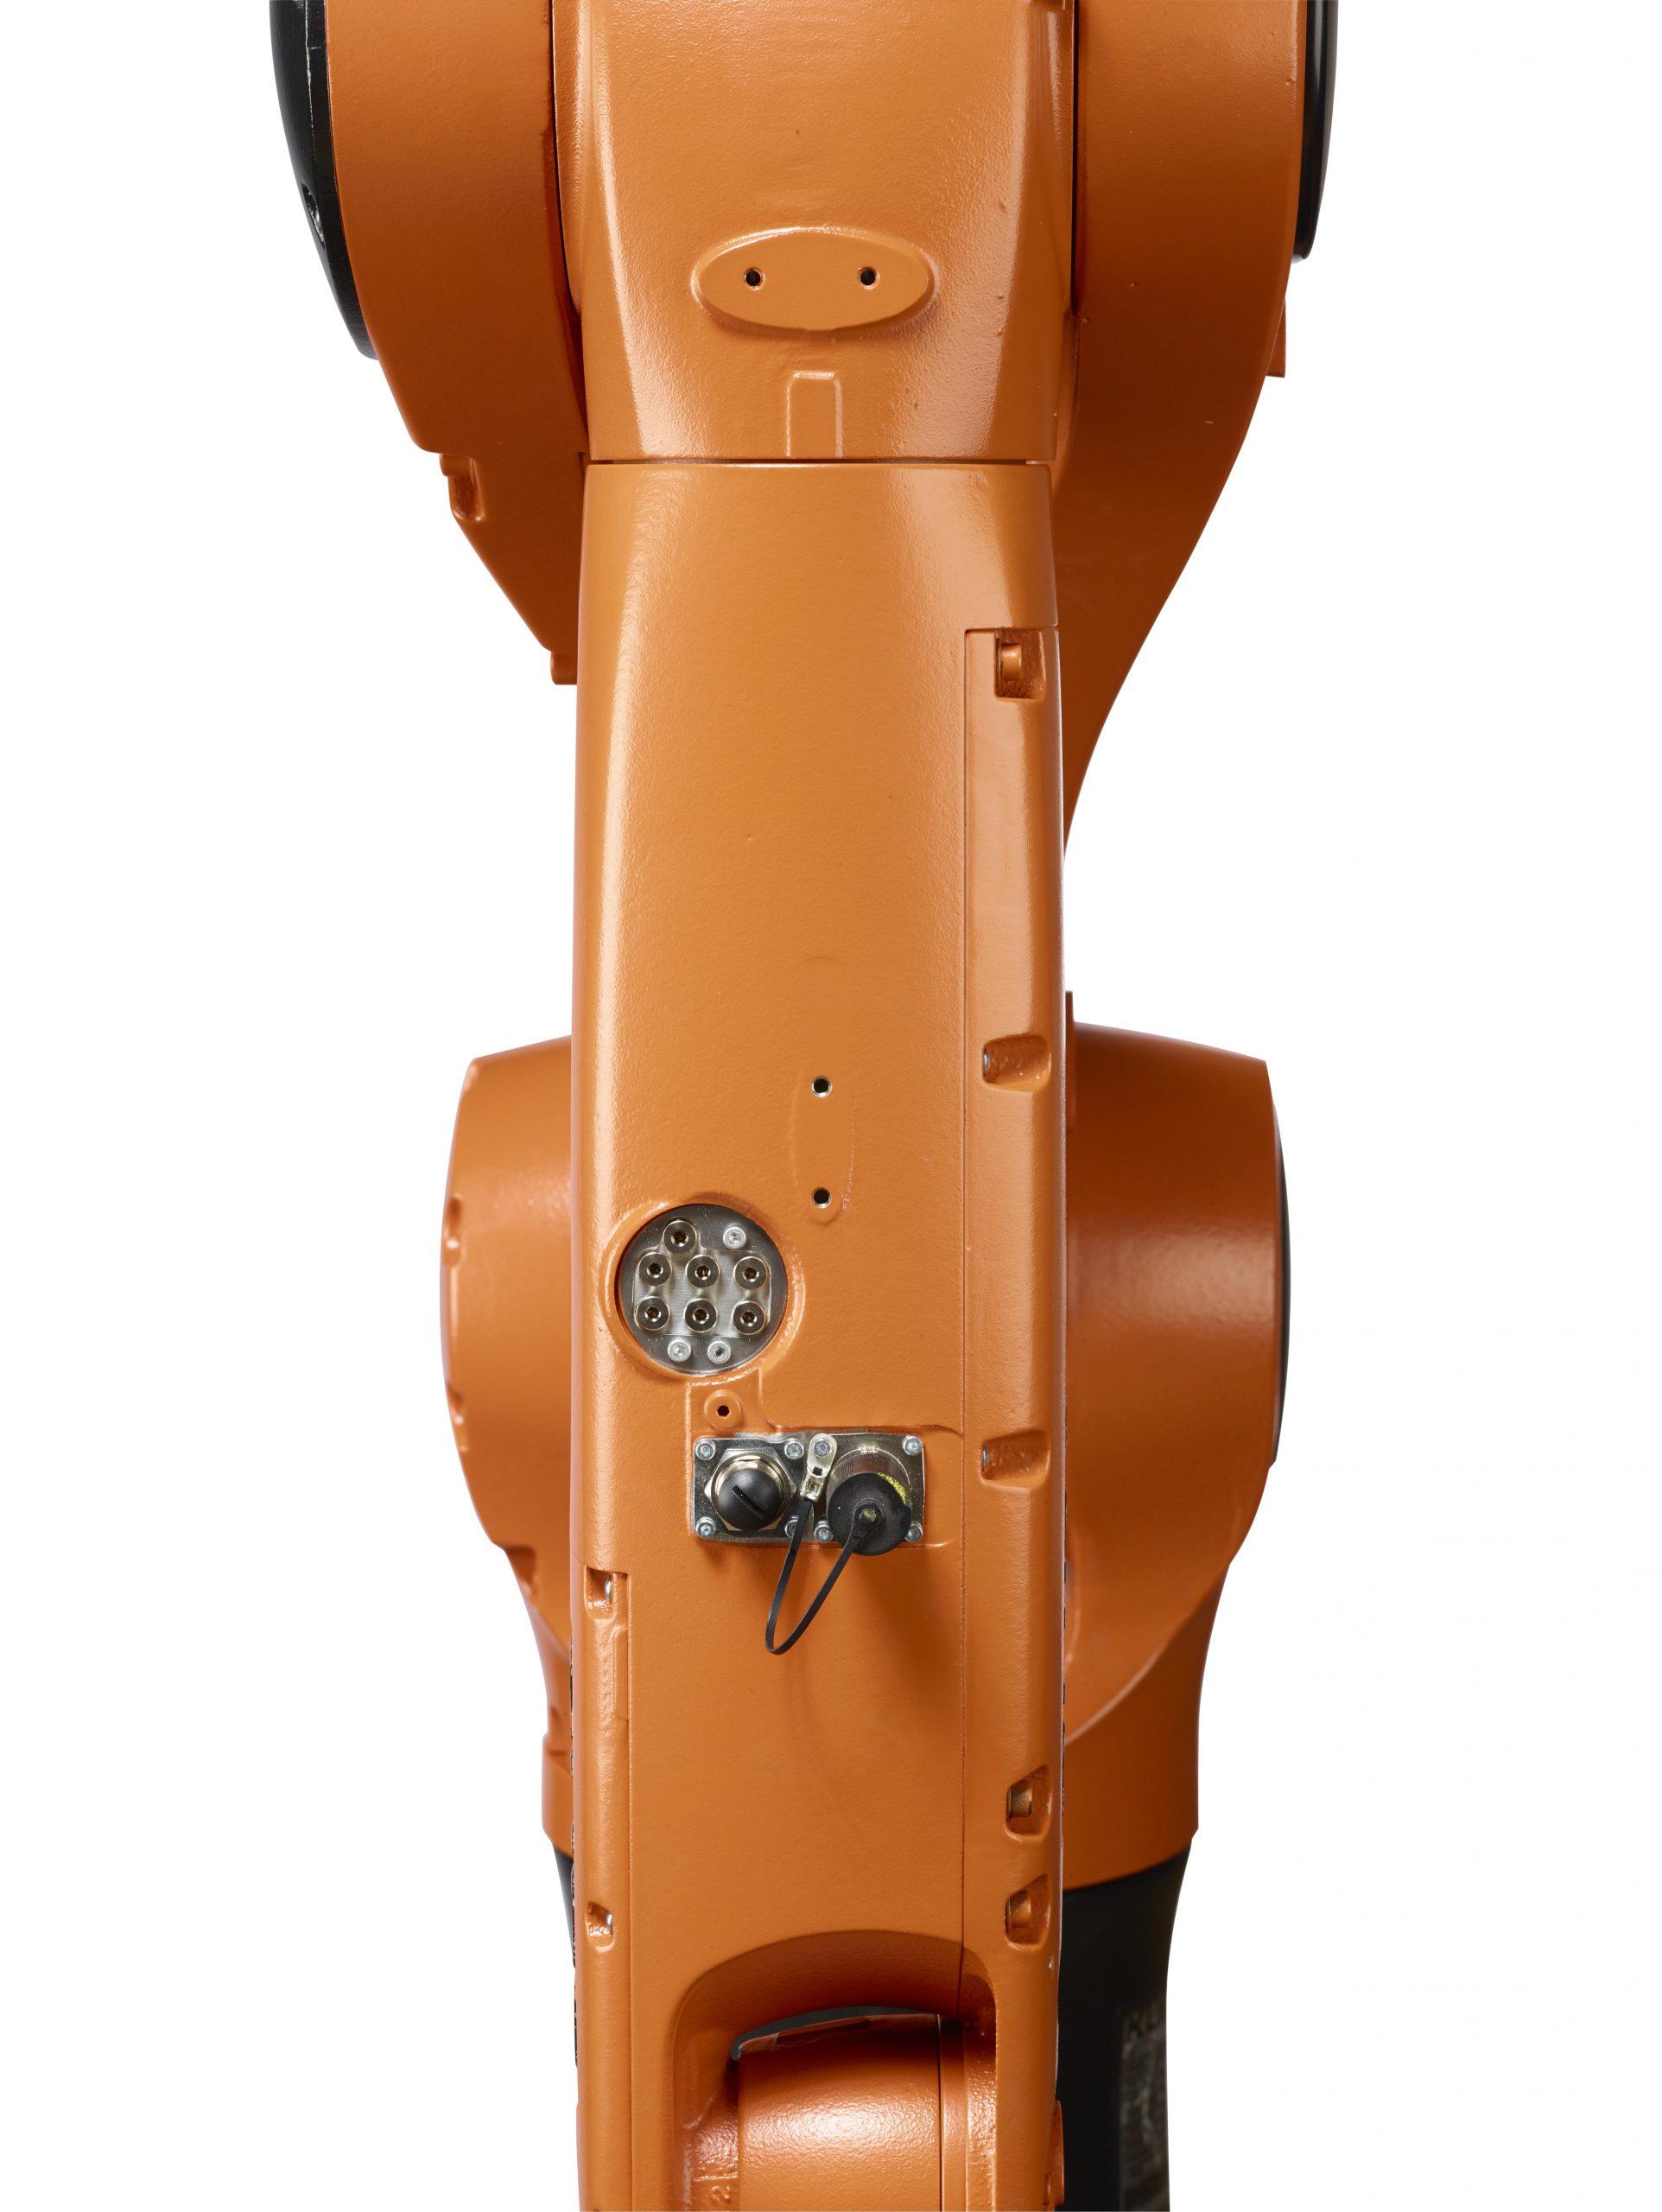 KUKA KR 10 R1100 sixx WP (KR AGILUS)-8